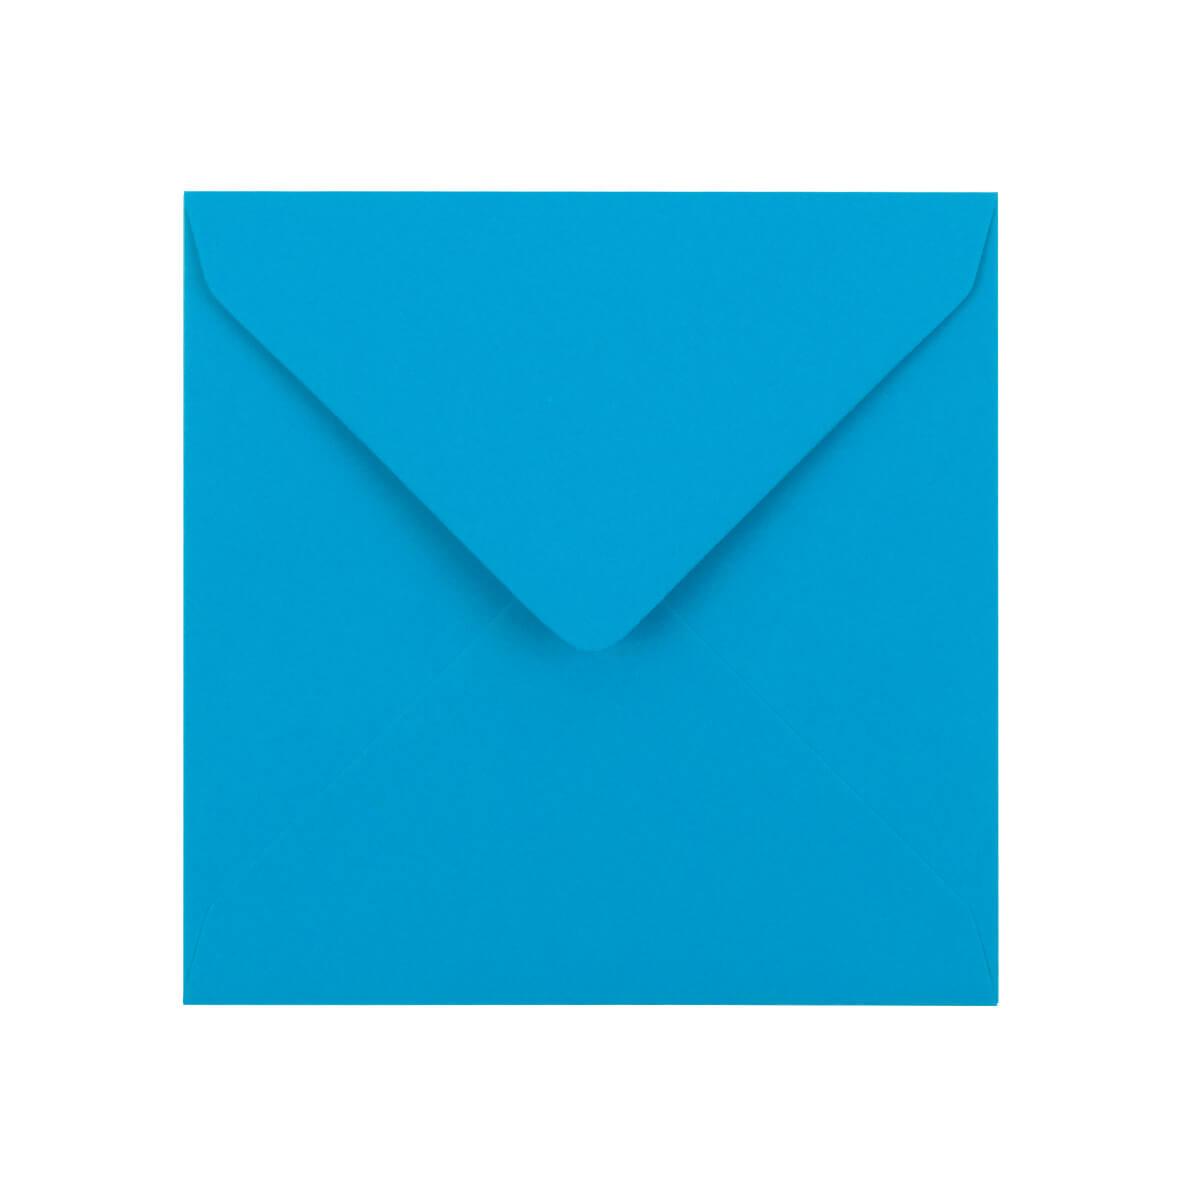 110 x 110mm BRIGHT BLUE ENVELOPES